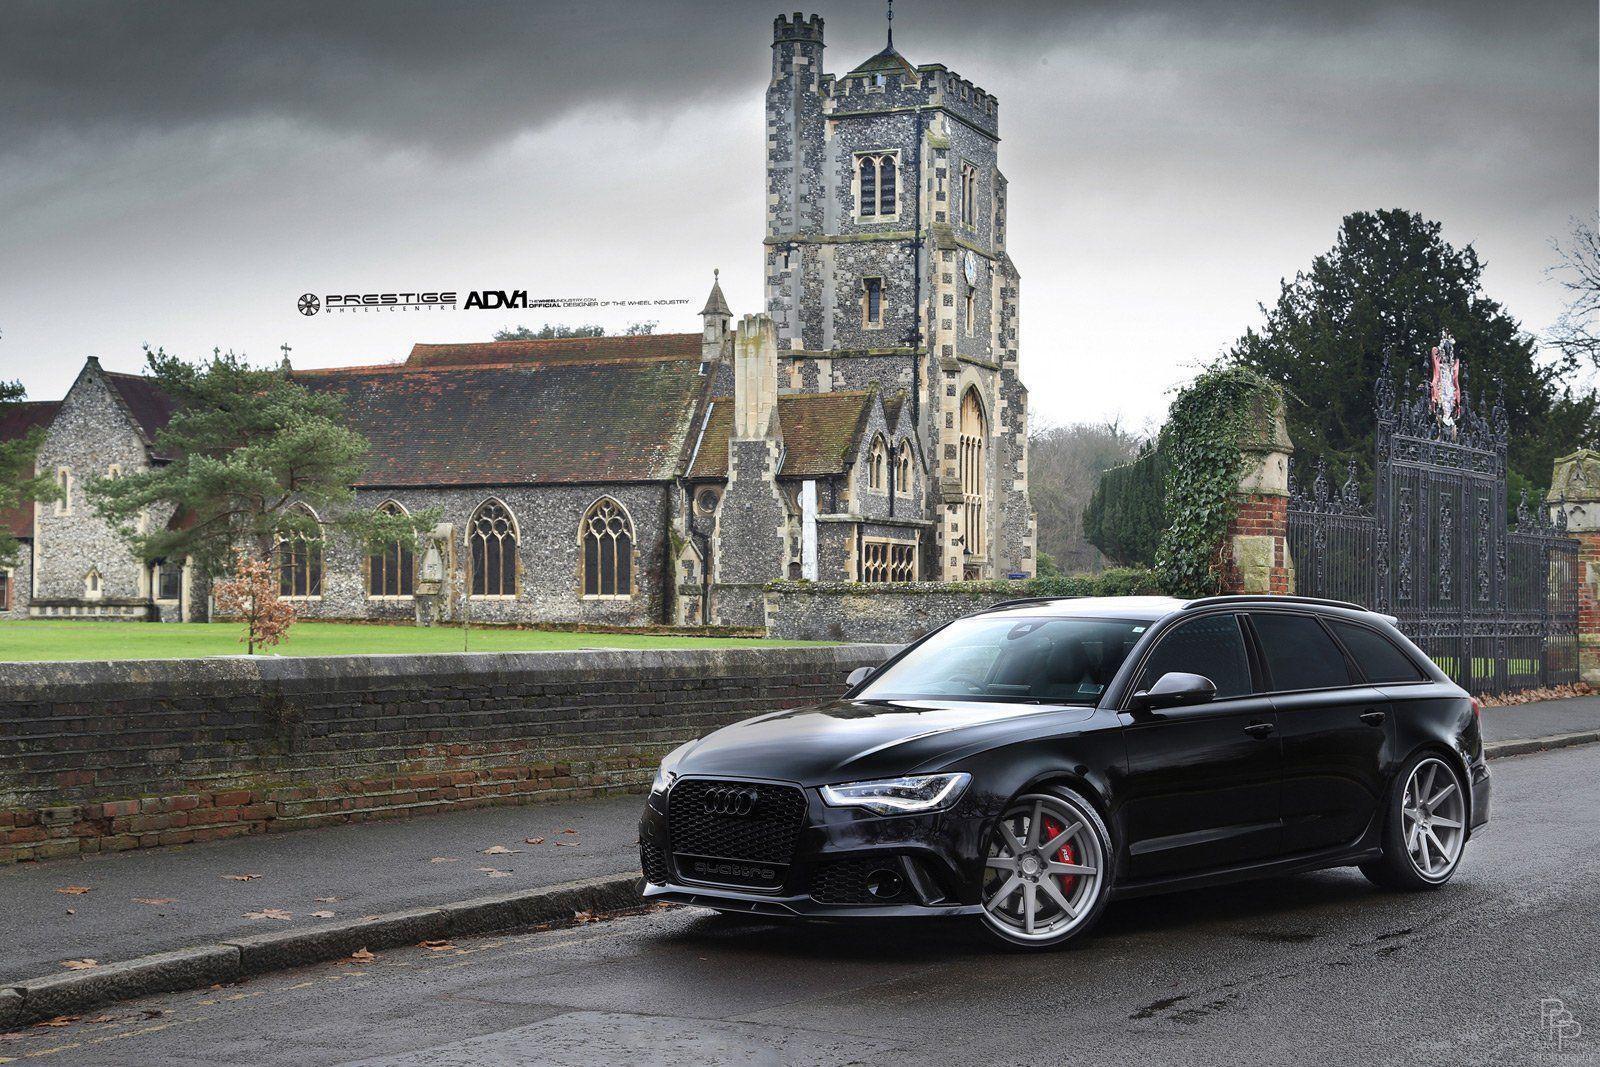 2014 Jon-Olsson Audi RS6 Avant tuning (2) wallpaper | 2000x1313 ...